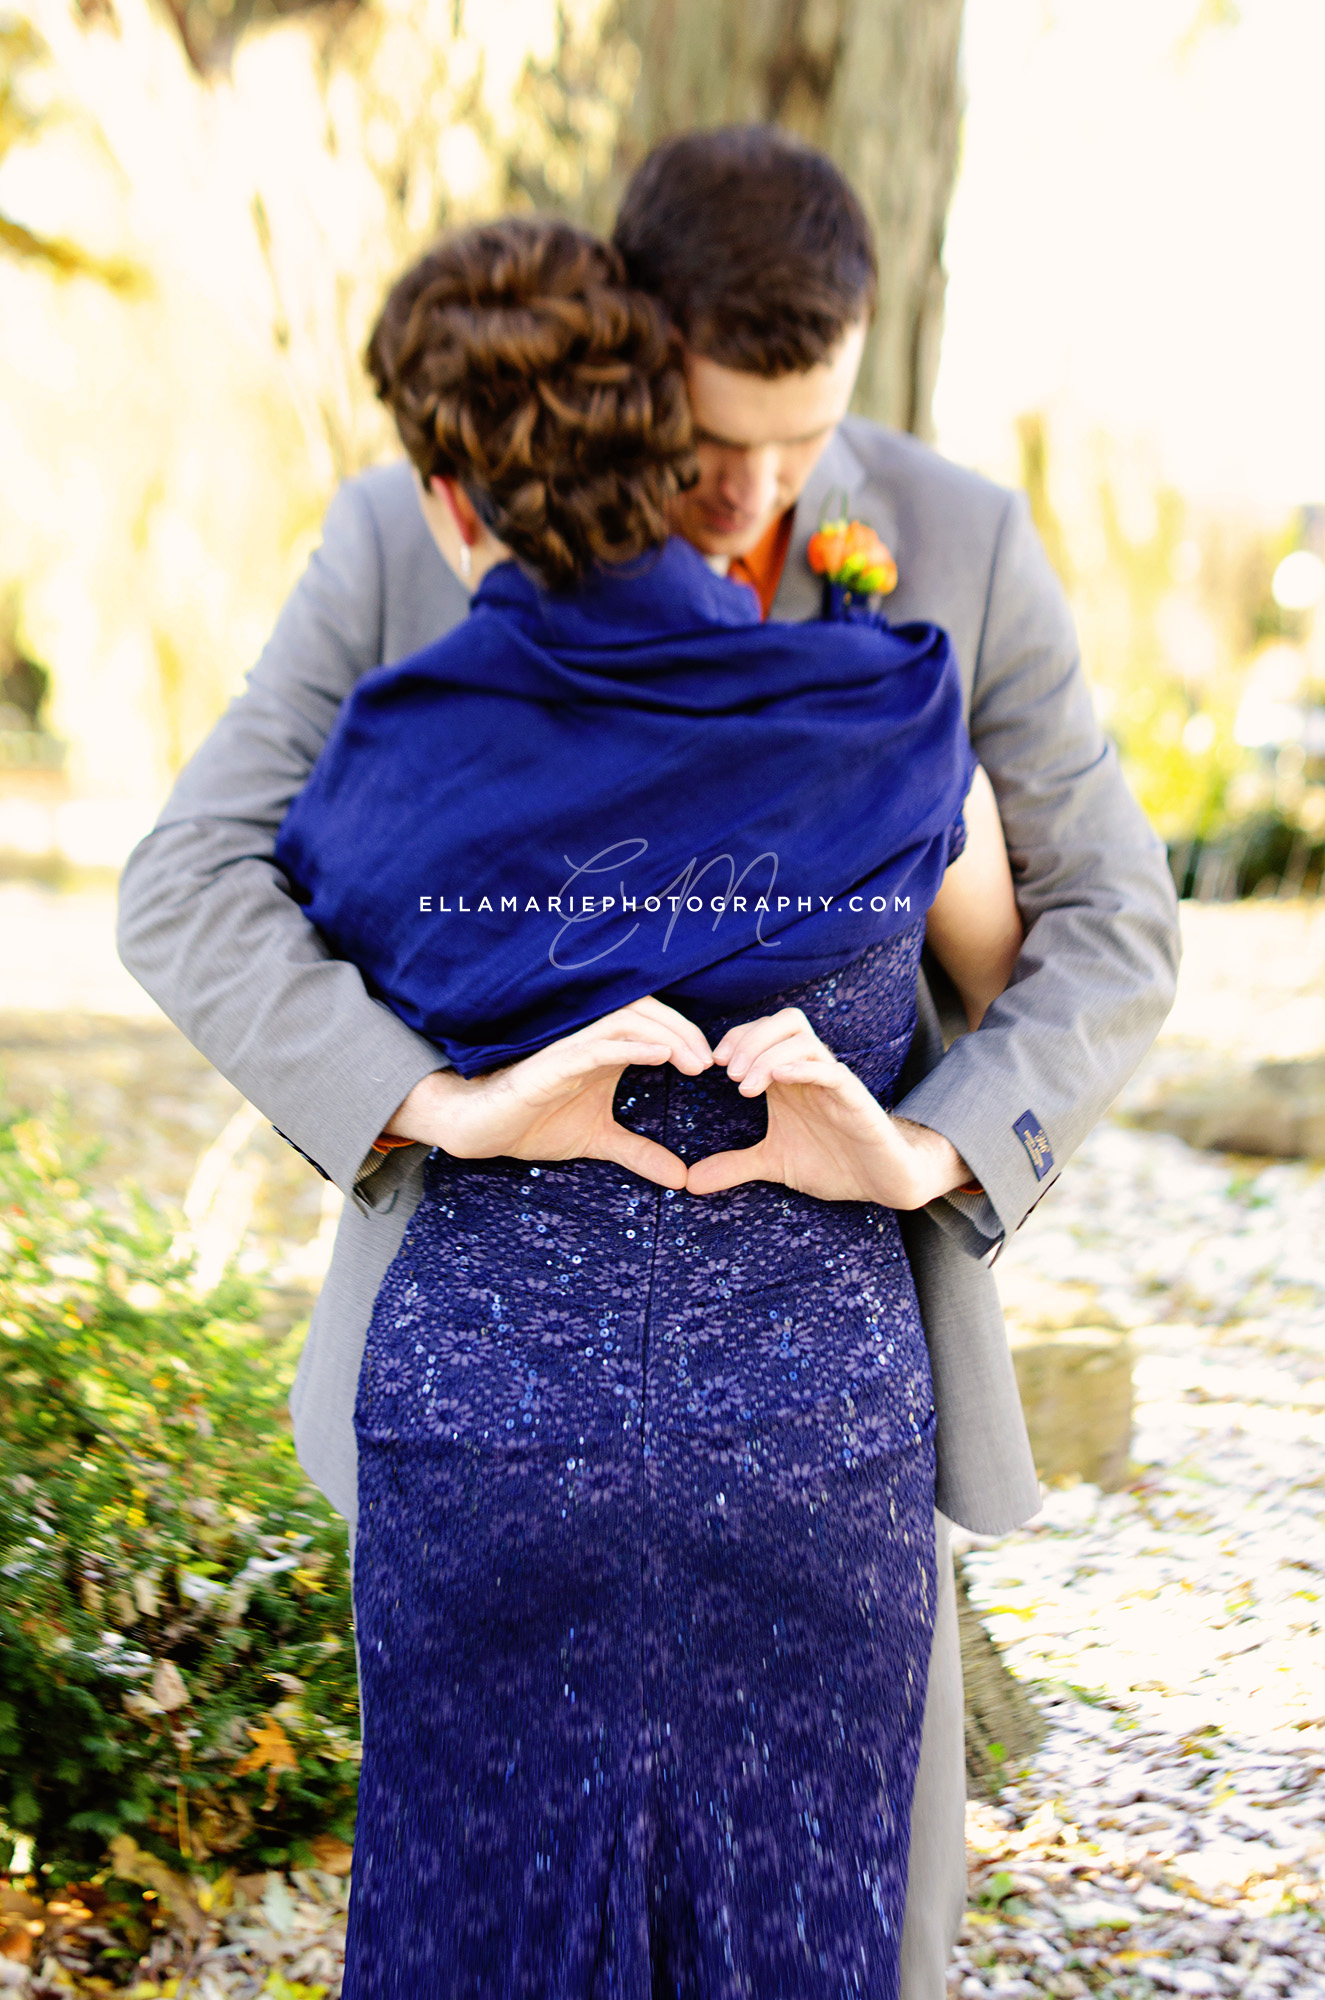 EllaMariePhotography_wedding_Baden_ON_New_Hamburg_Stratford_Waterloo_Kitchener_Guelph_Cambridge_Listowel_photographer_photography_08.jpg